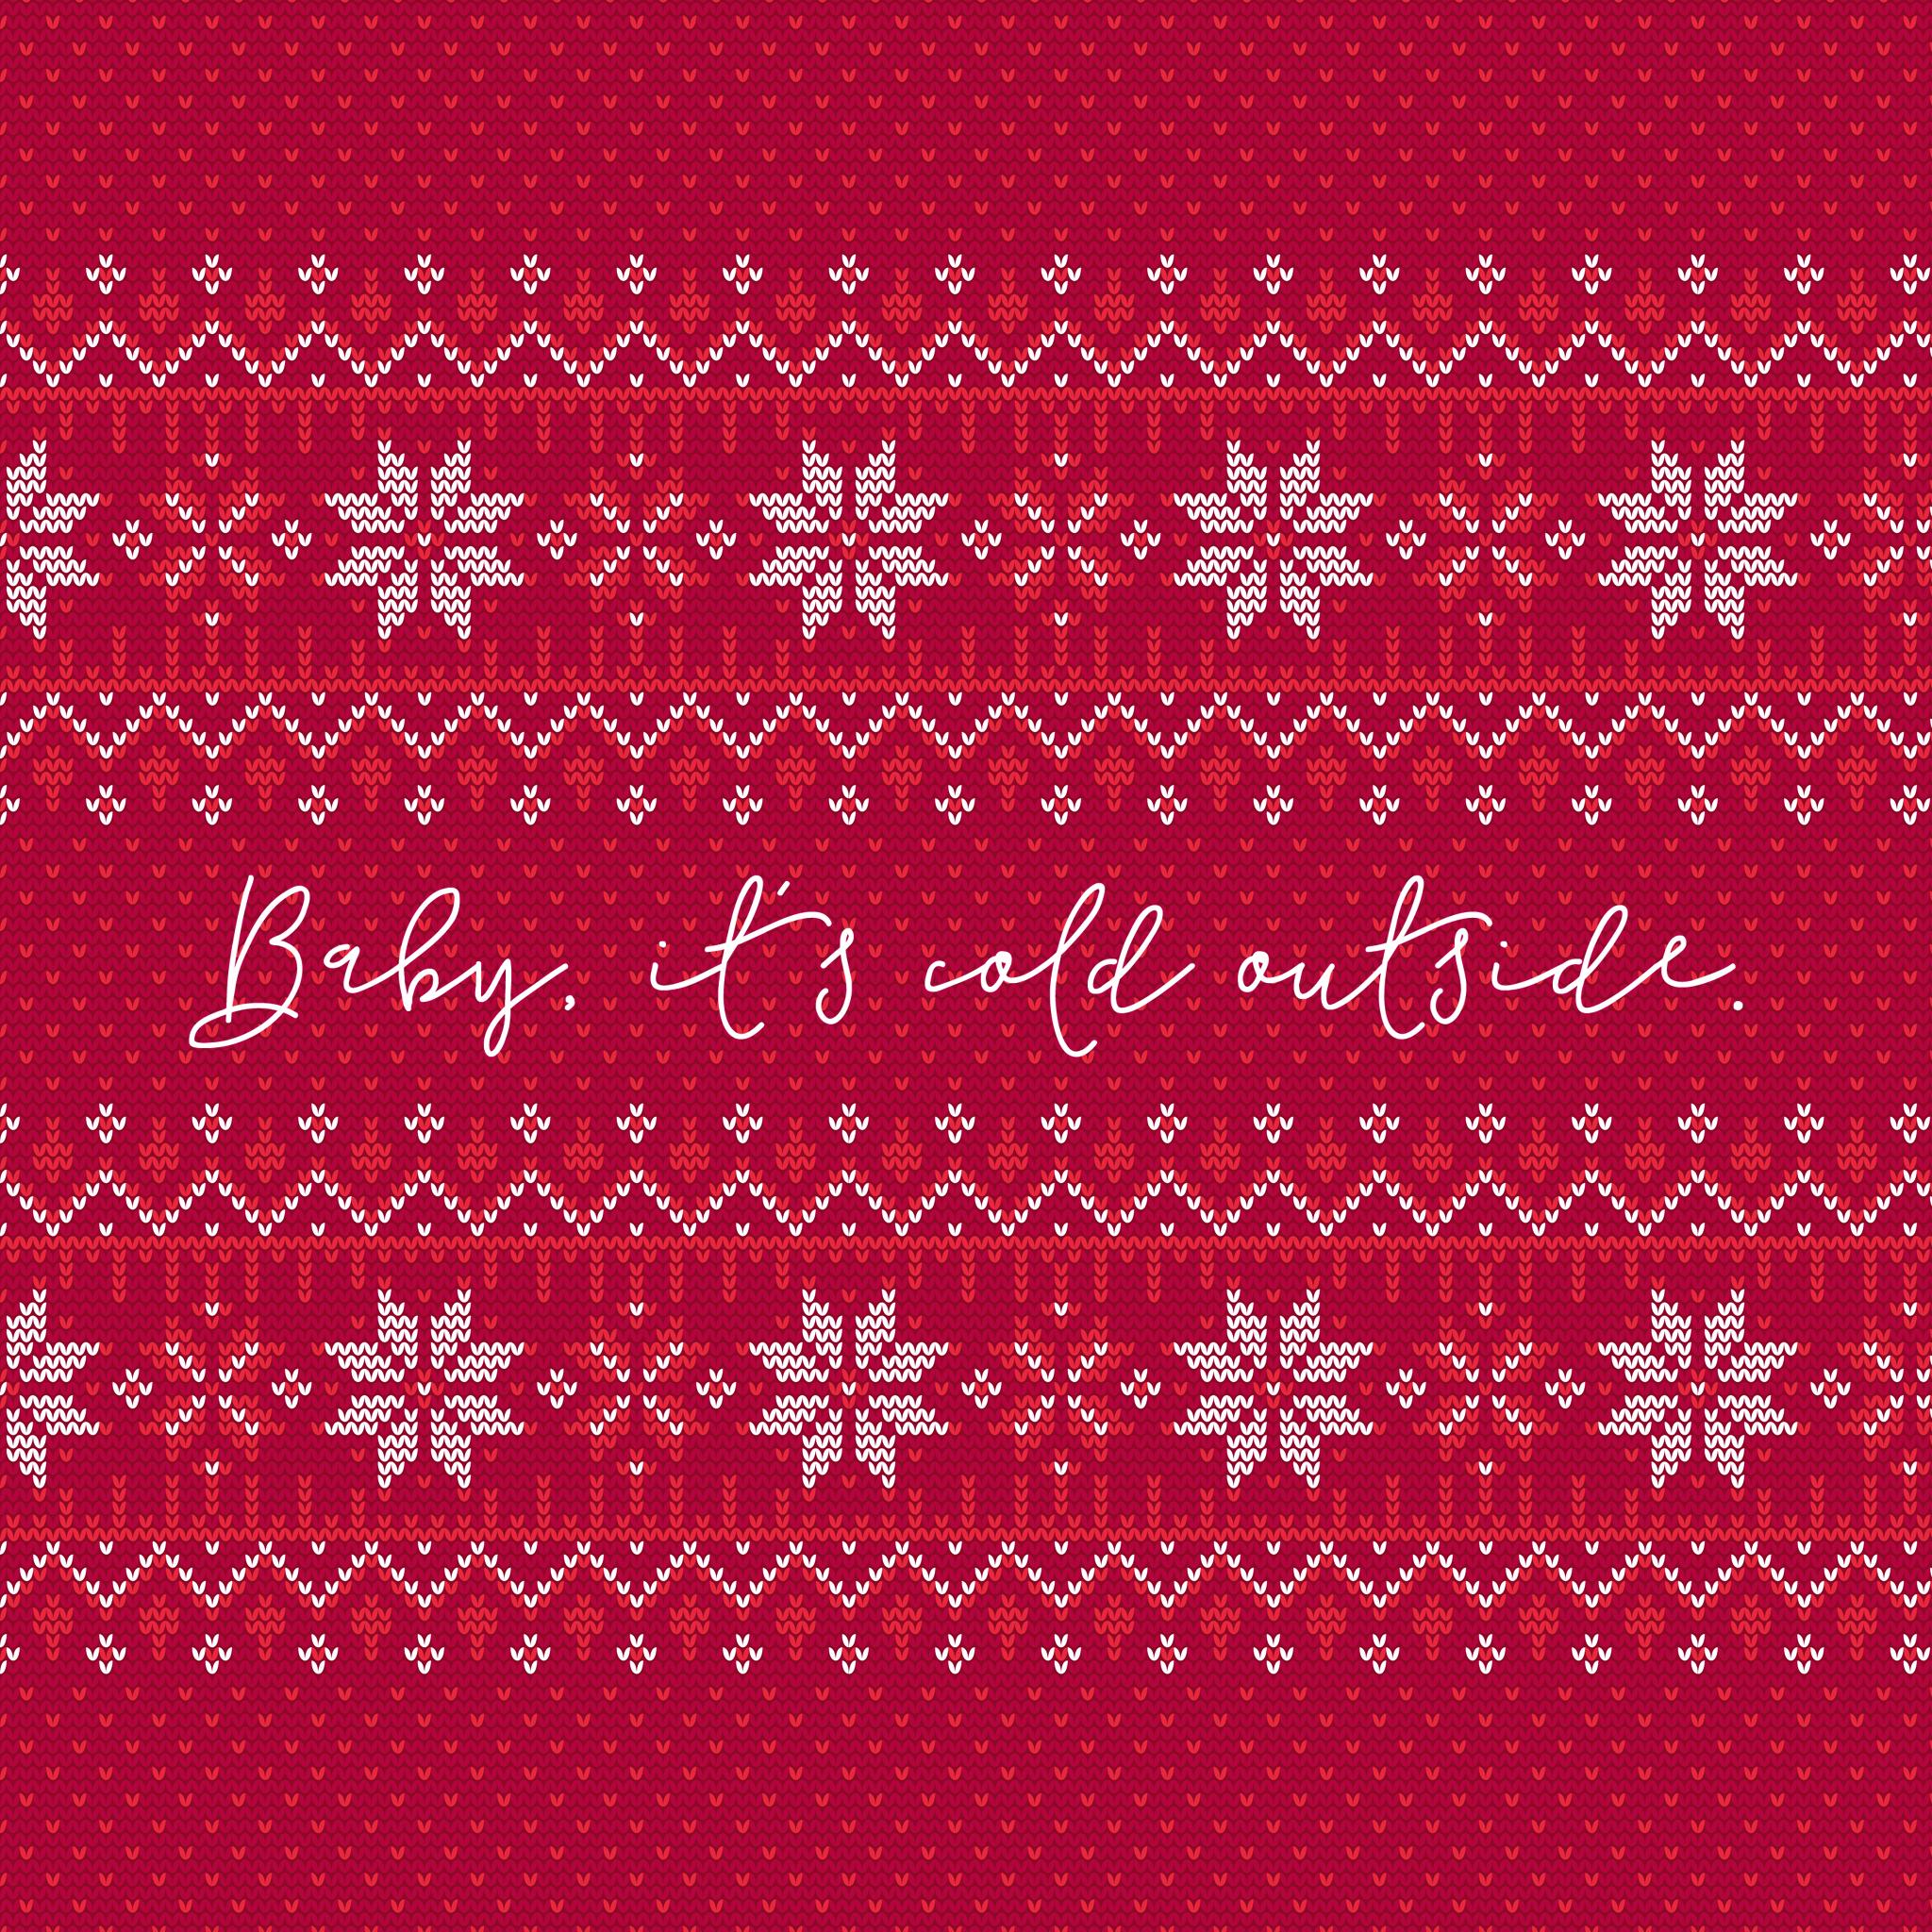 christmas sweater ipad wallpaper - Christmas Sweater Wallpaper